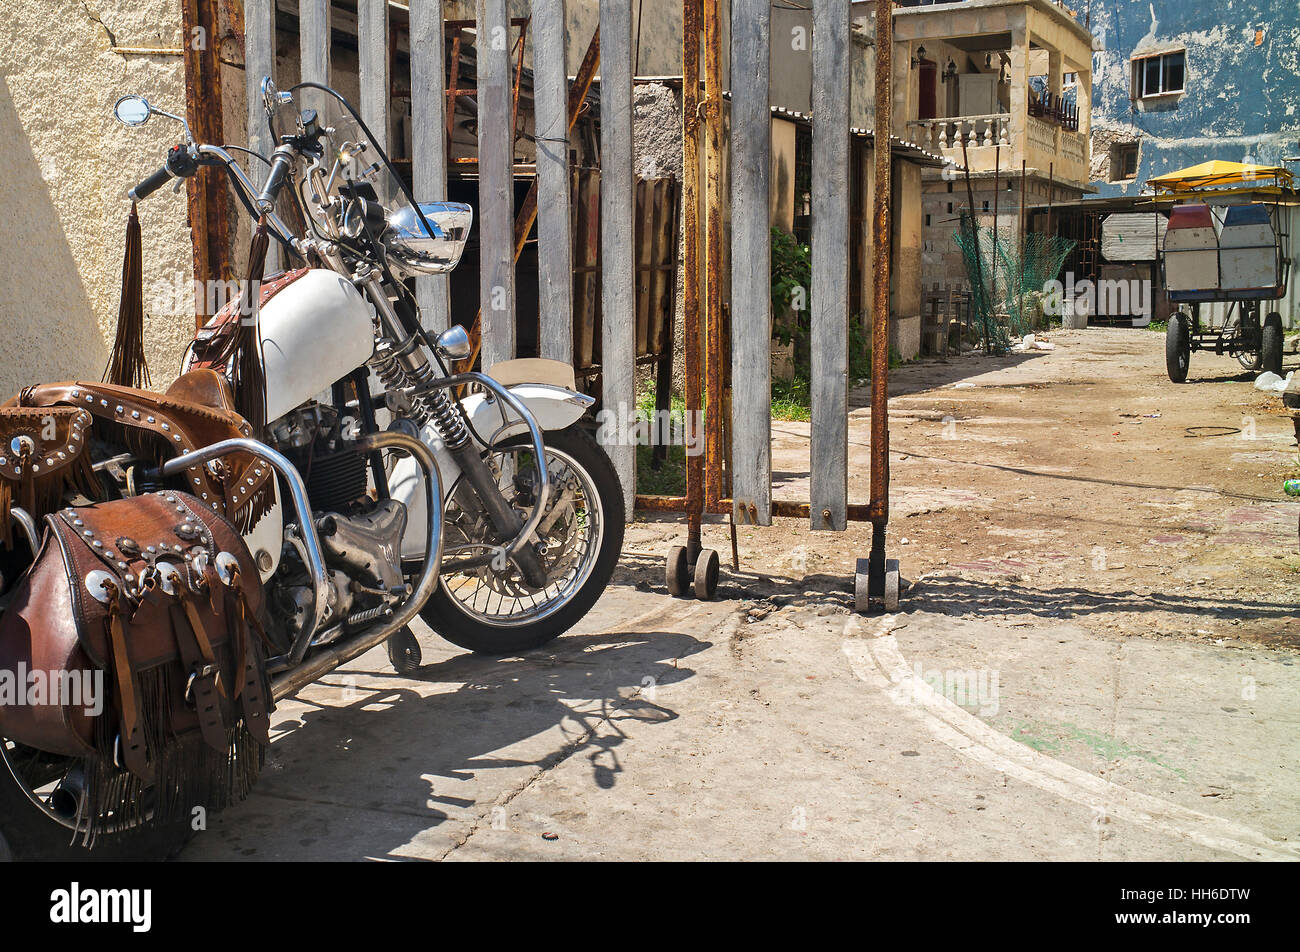 motorbike with leather sadle bags leather helmet outside rickshaw garage Havana Cuba - Stock Image